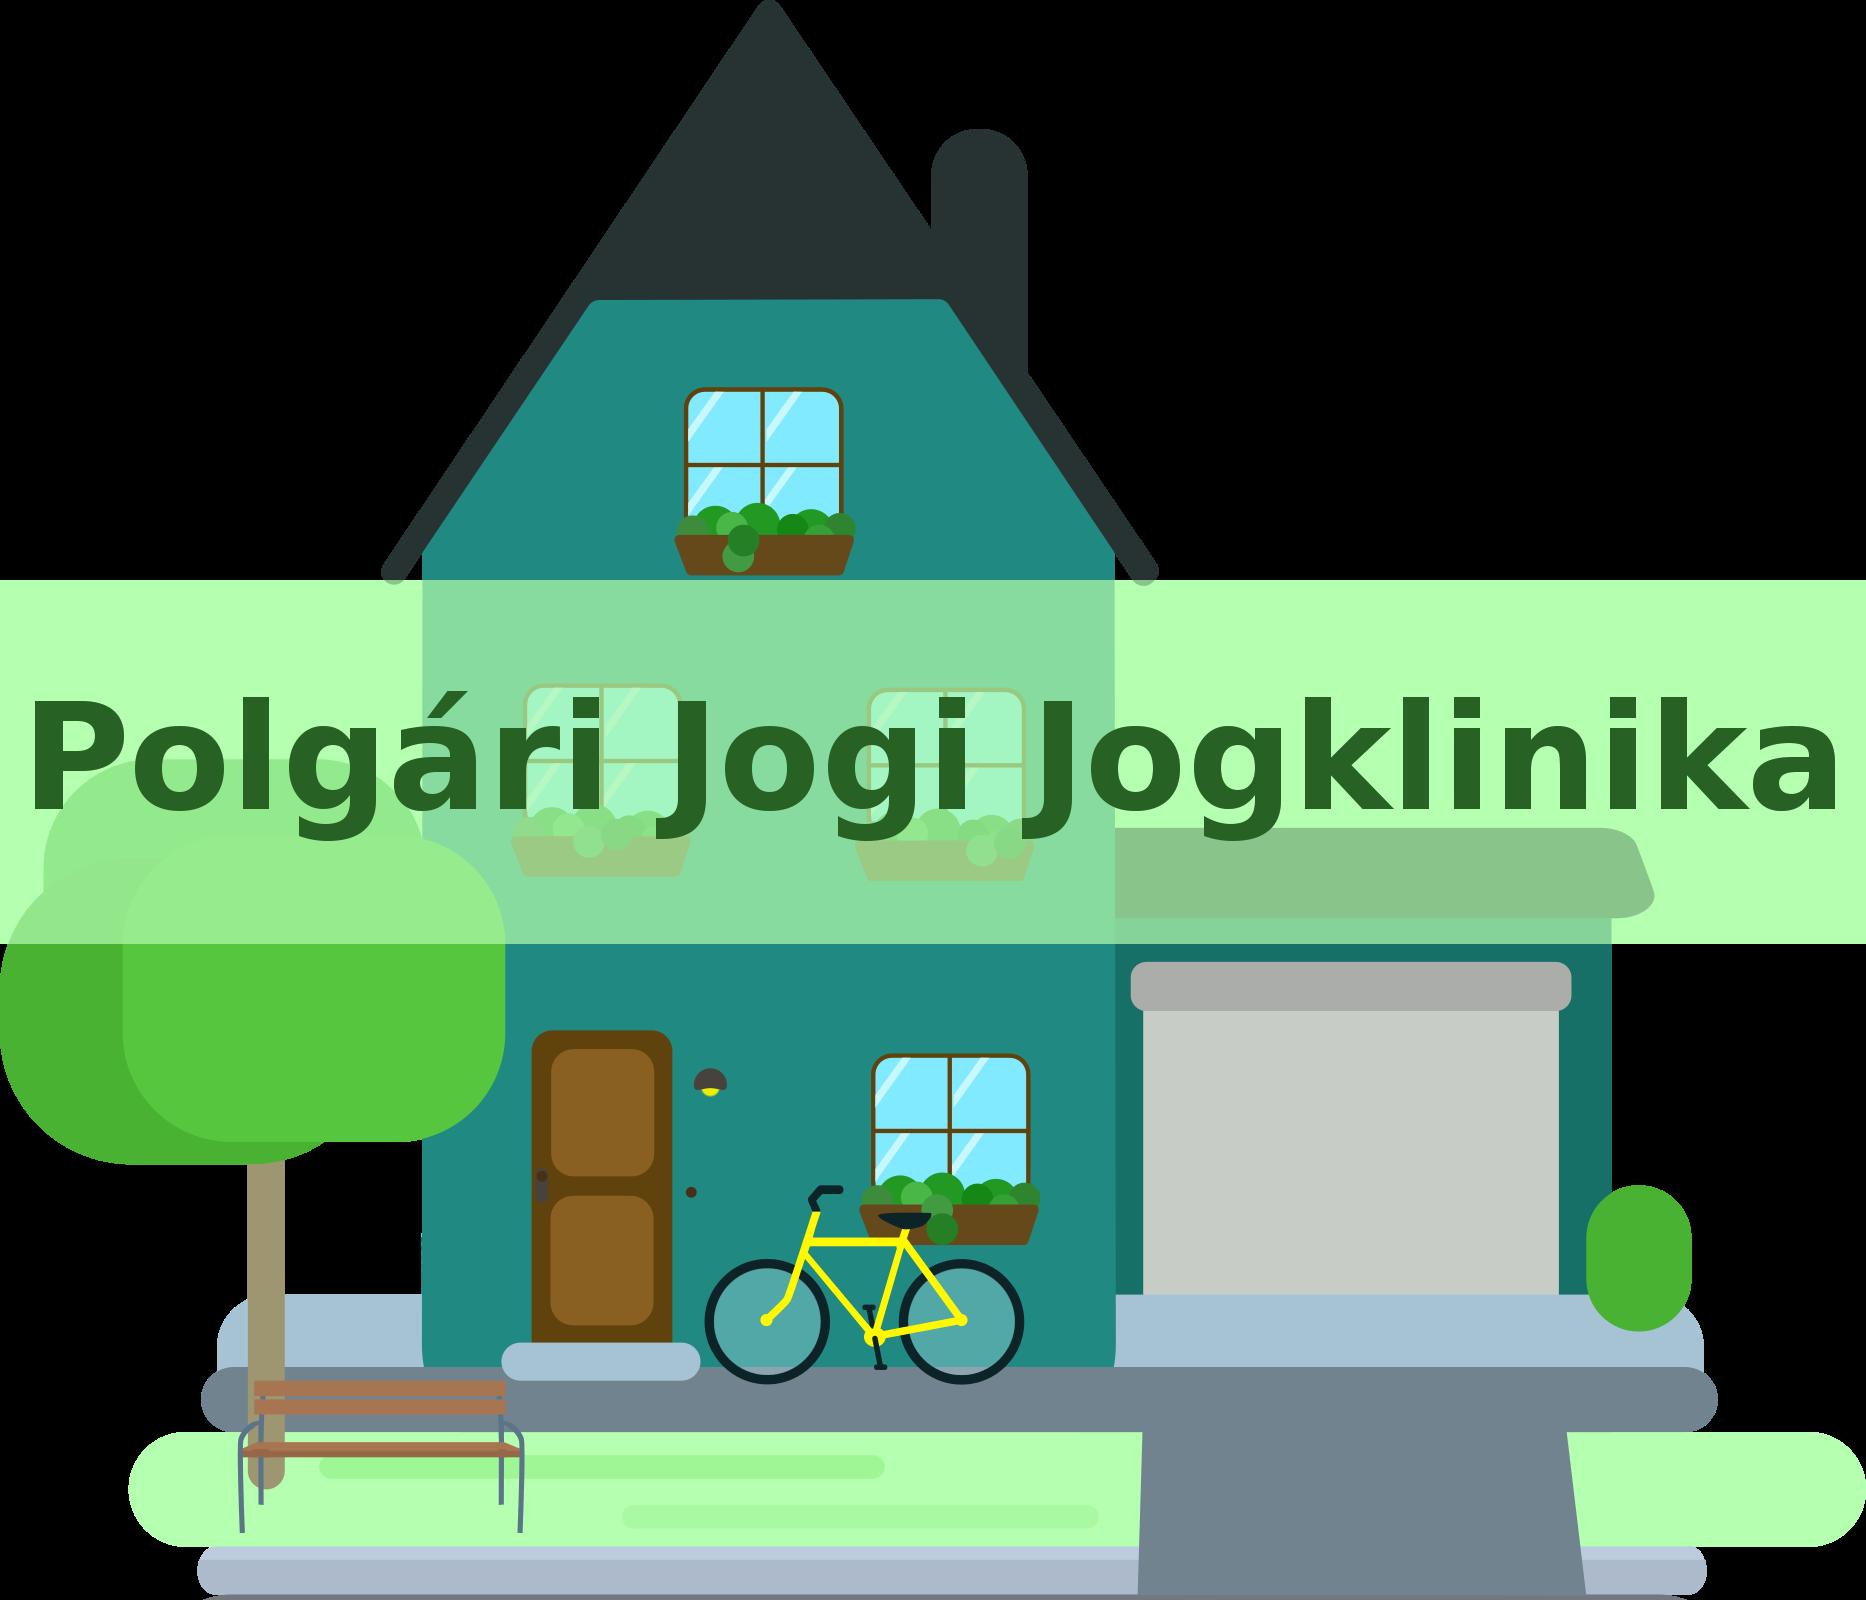 Polgári Jogi Jogklinika